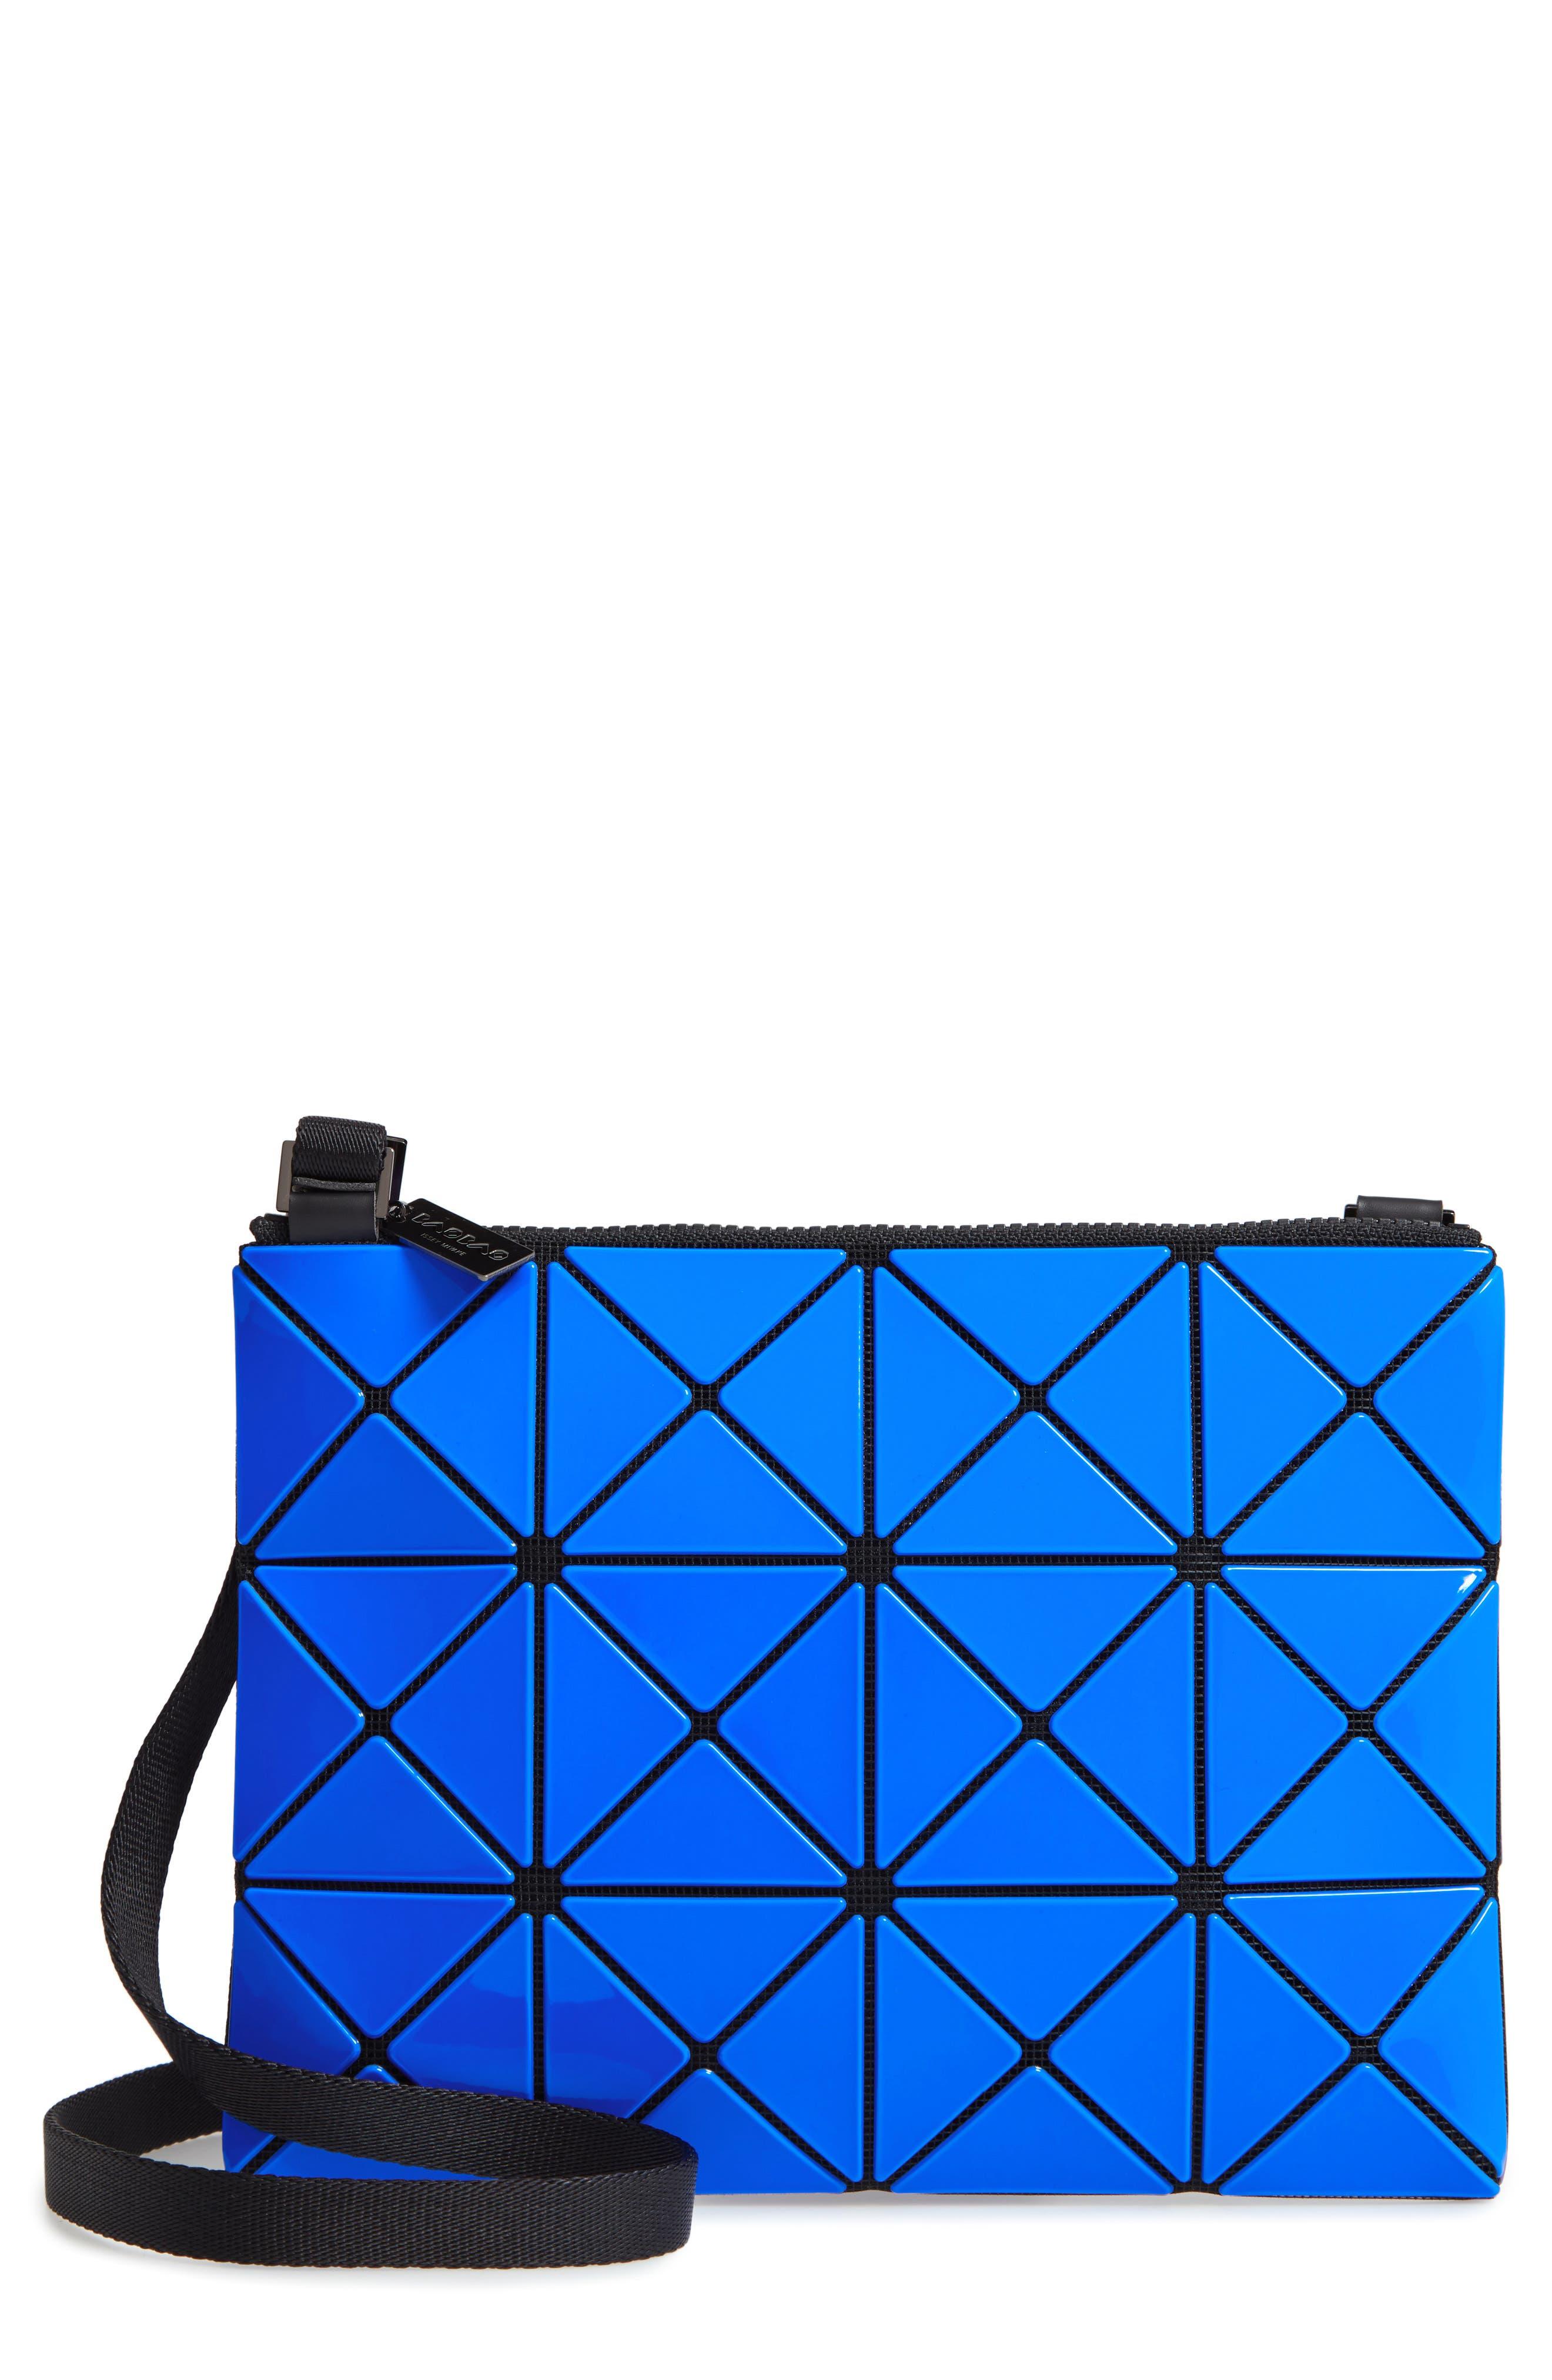 Lucent Two-Tone Crossbody Bag,                             Main thumbnail 1, color,                             BLUE/ DARK BLUE